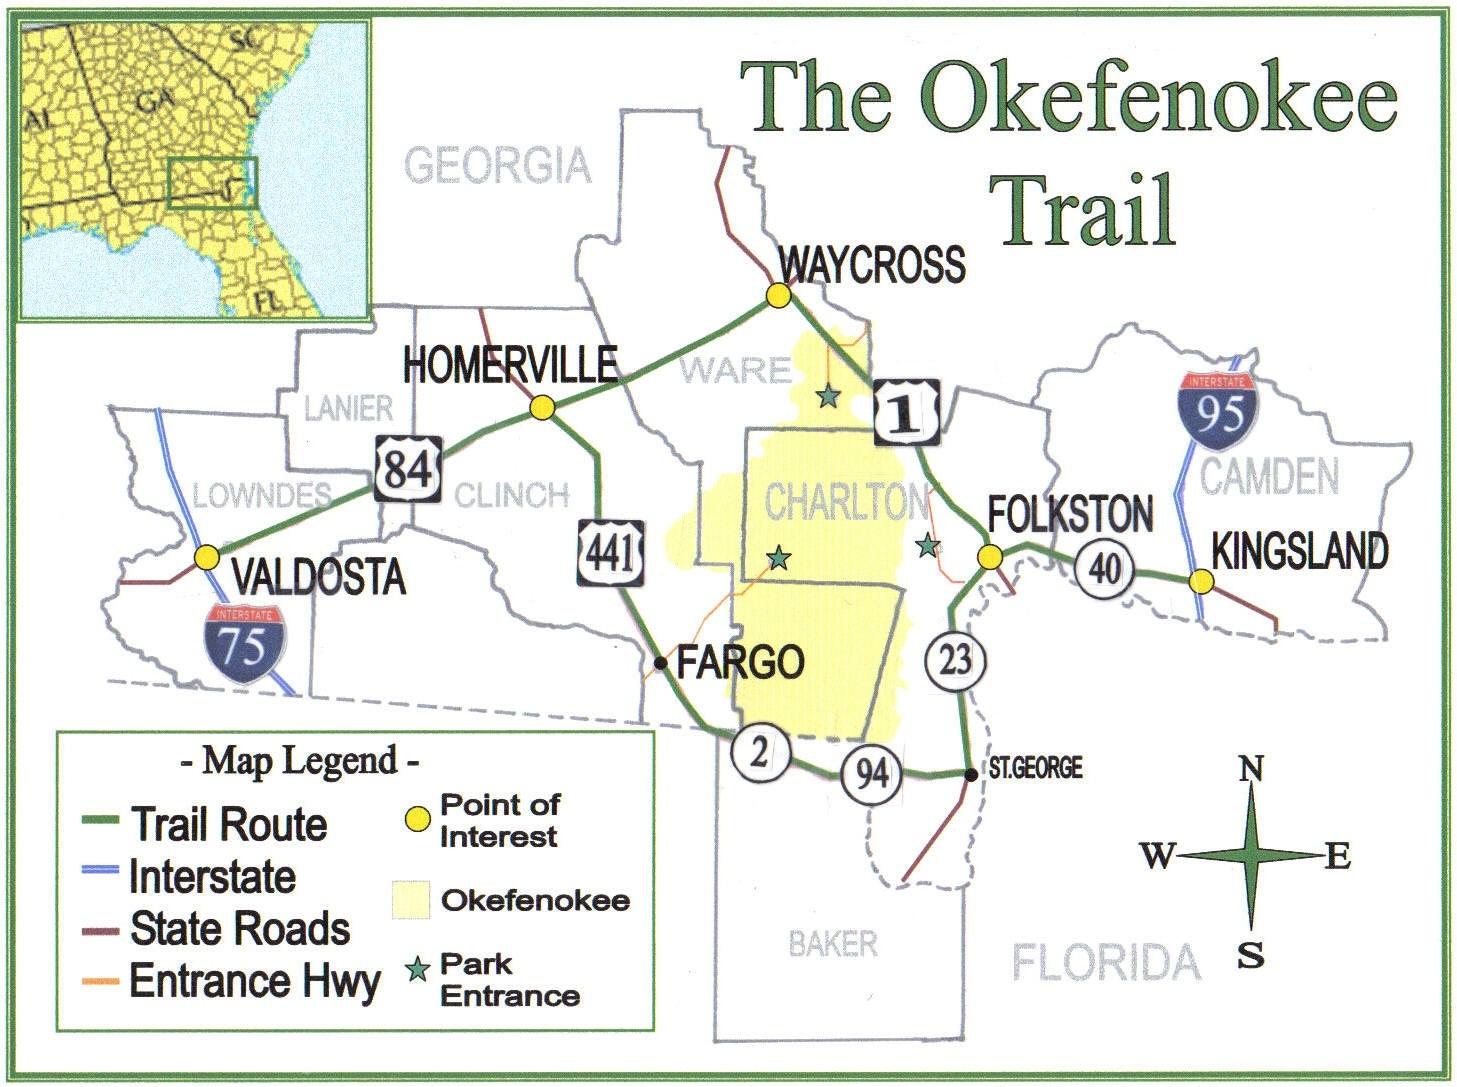 Map Of Kingsland Georgia.The Okefenokee Trail Official Georgia Tourism Travel Website